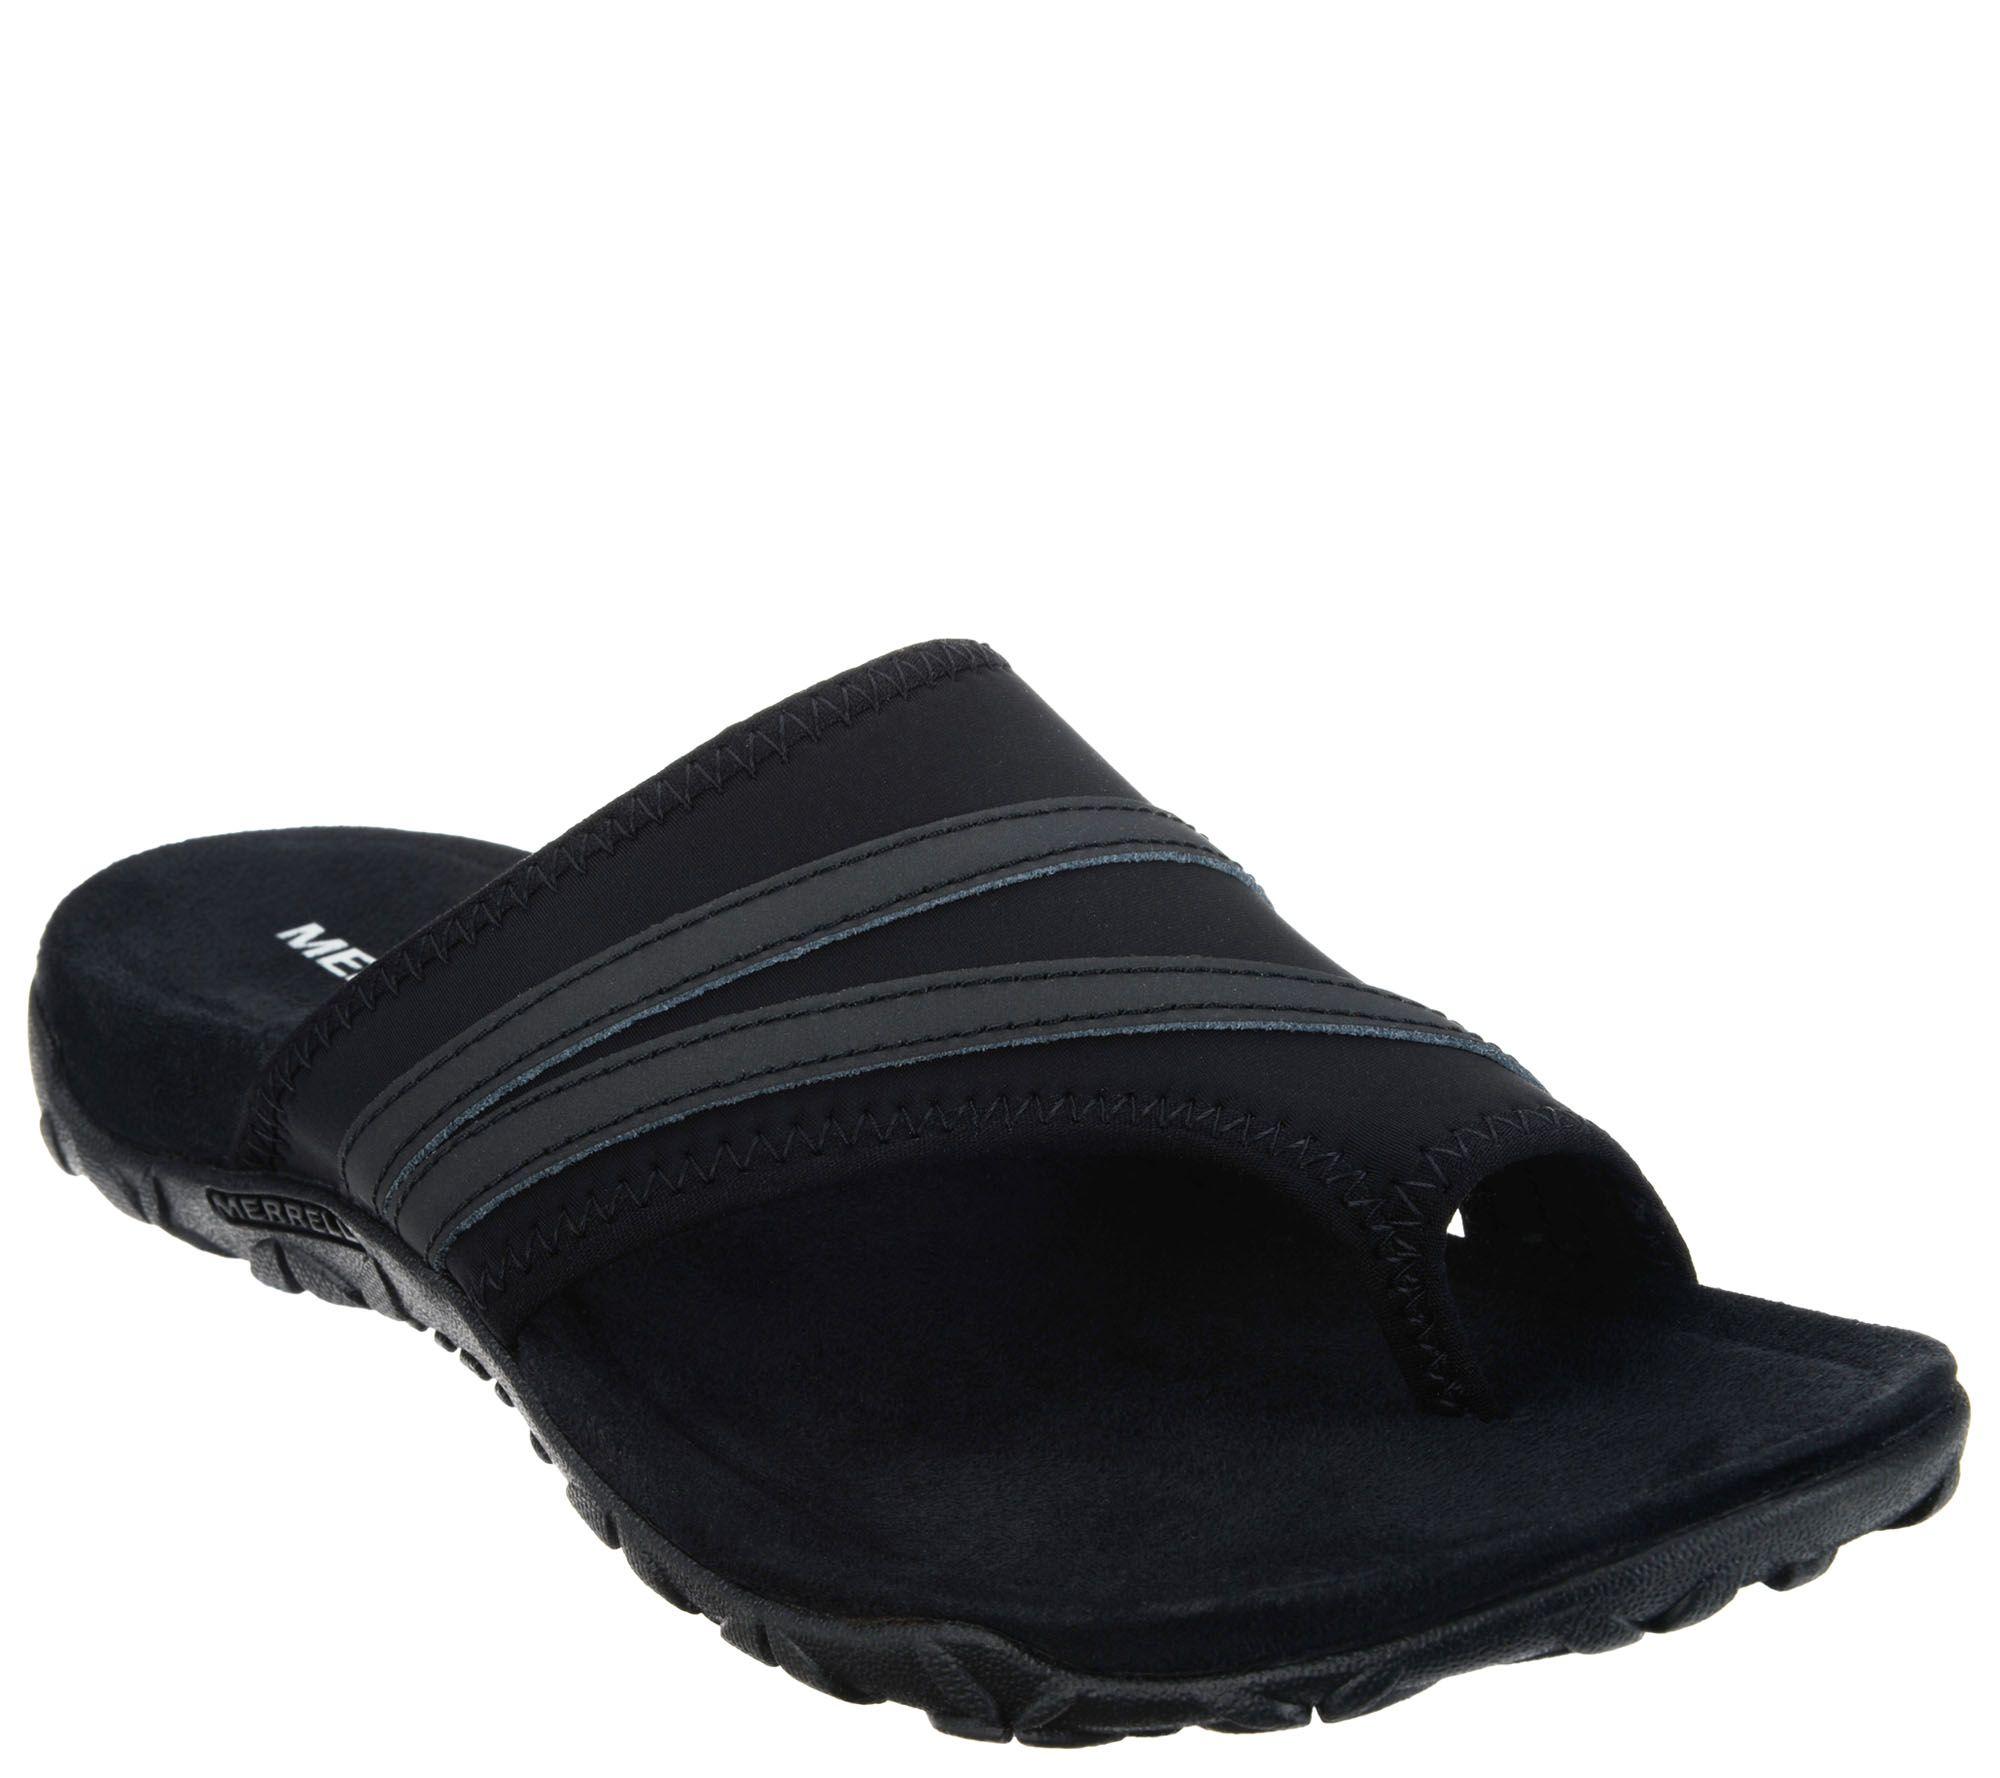 38b27cc6b522 Merrell Leather   Textile Sandals - Terran Ari Wrap - Page 1 — QVC.com